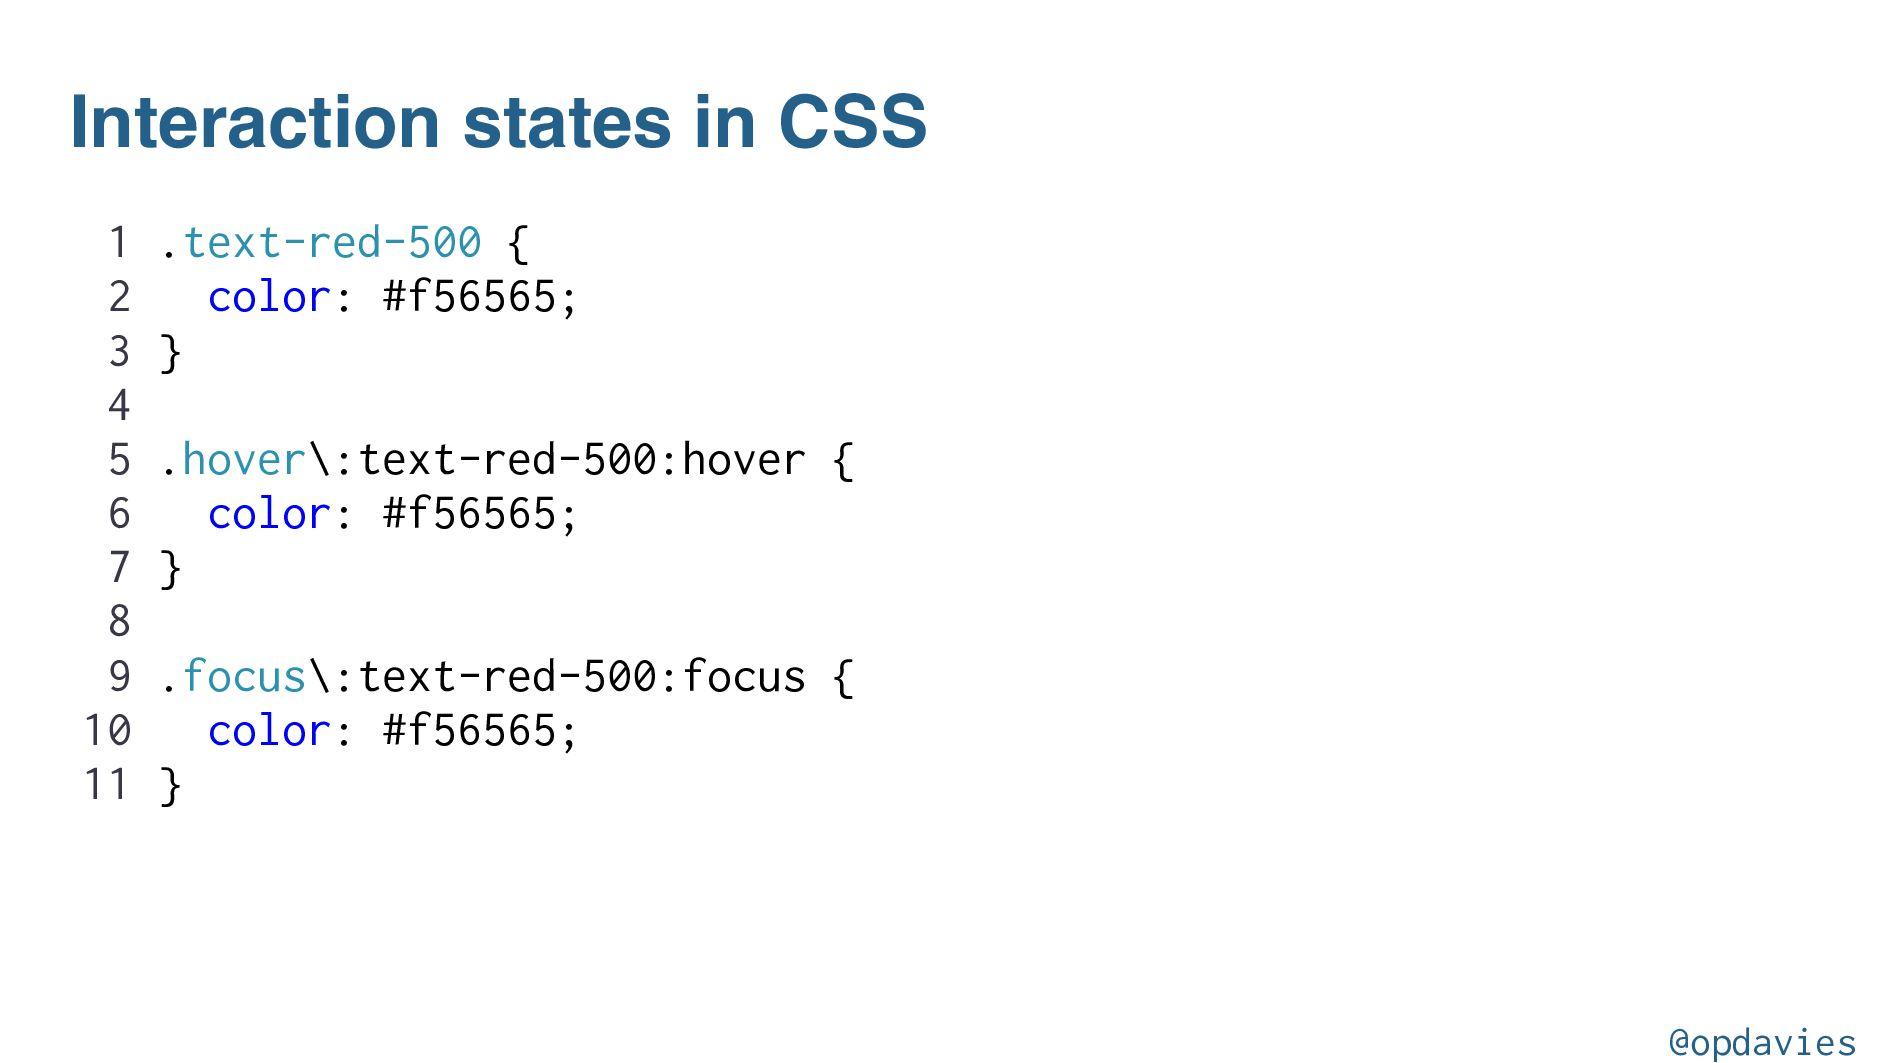 npx tailwind build src/css/tailwind.pcss -o dis...